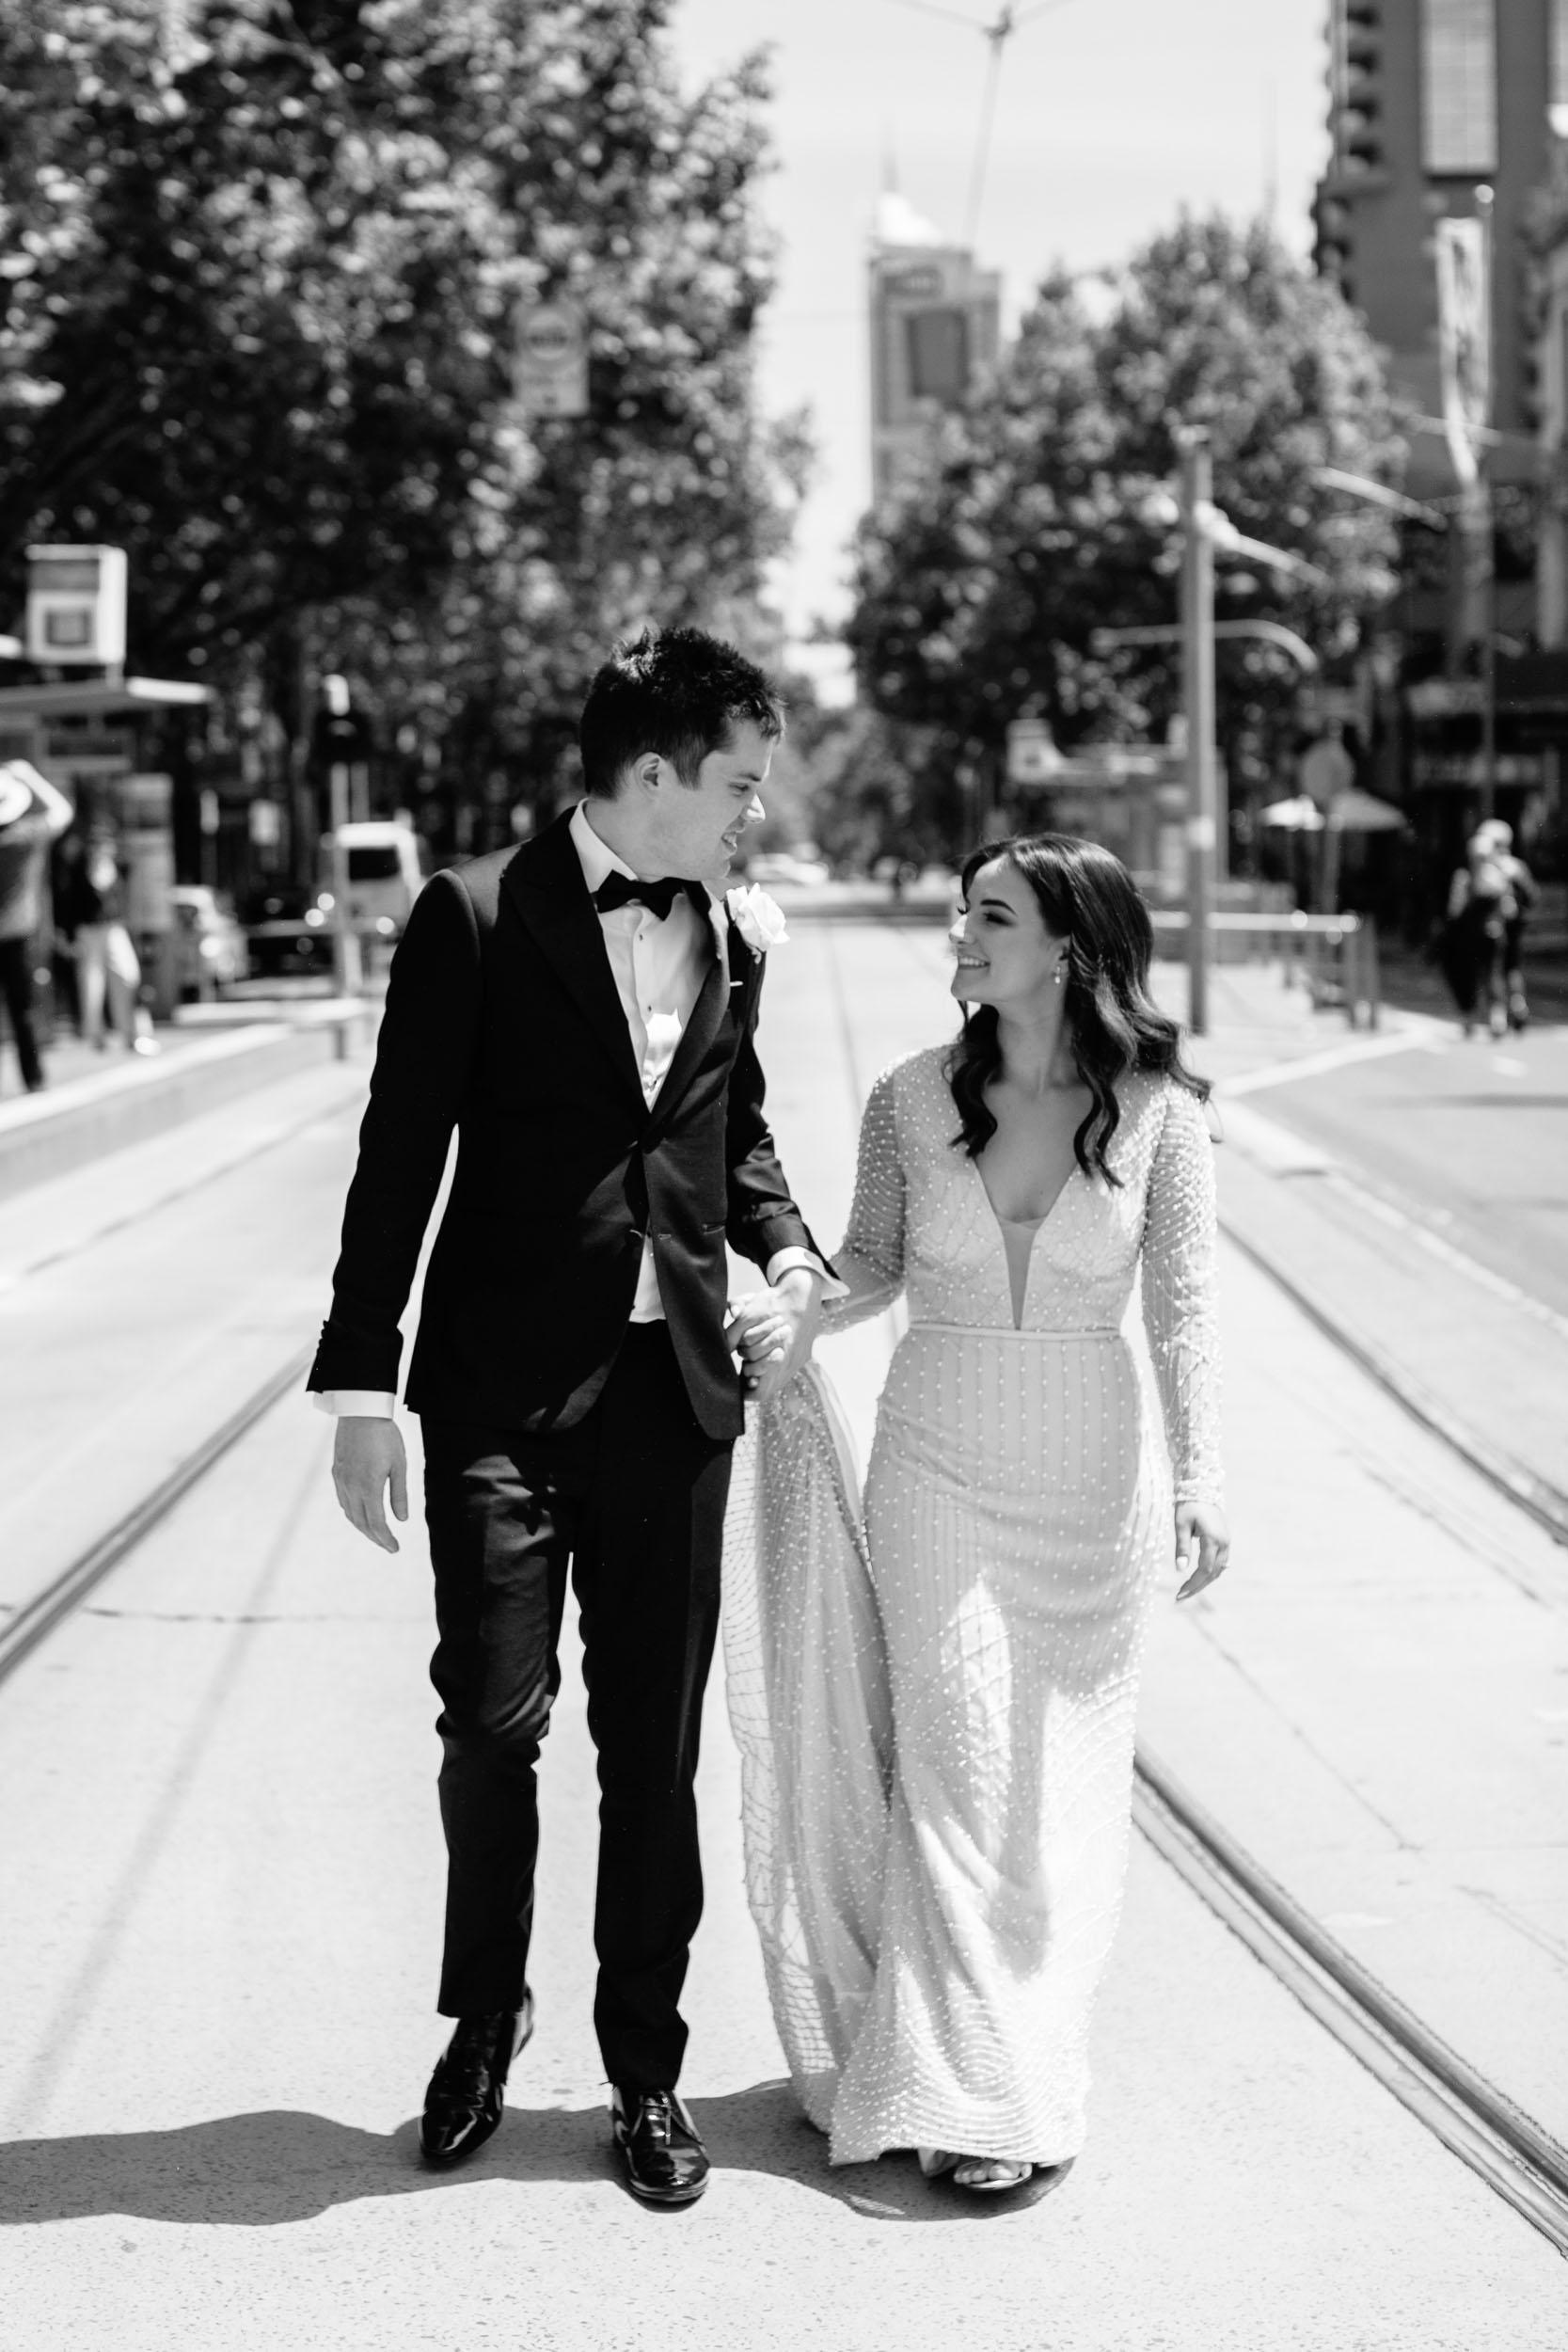 Kas-Richards-Wedding-Photographer-Melbourne-City-Wedding-Alto-Event-Space-Jane-Hill-Bridal-Gown-14.jpg